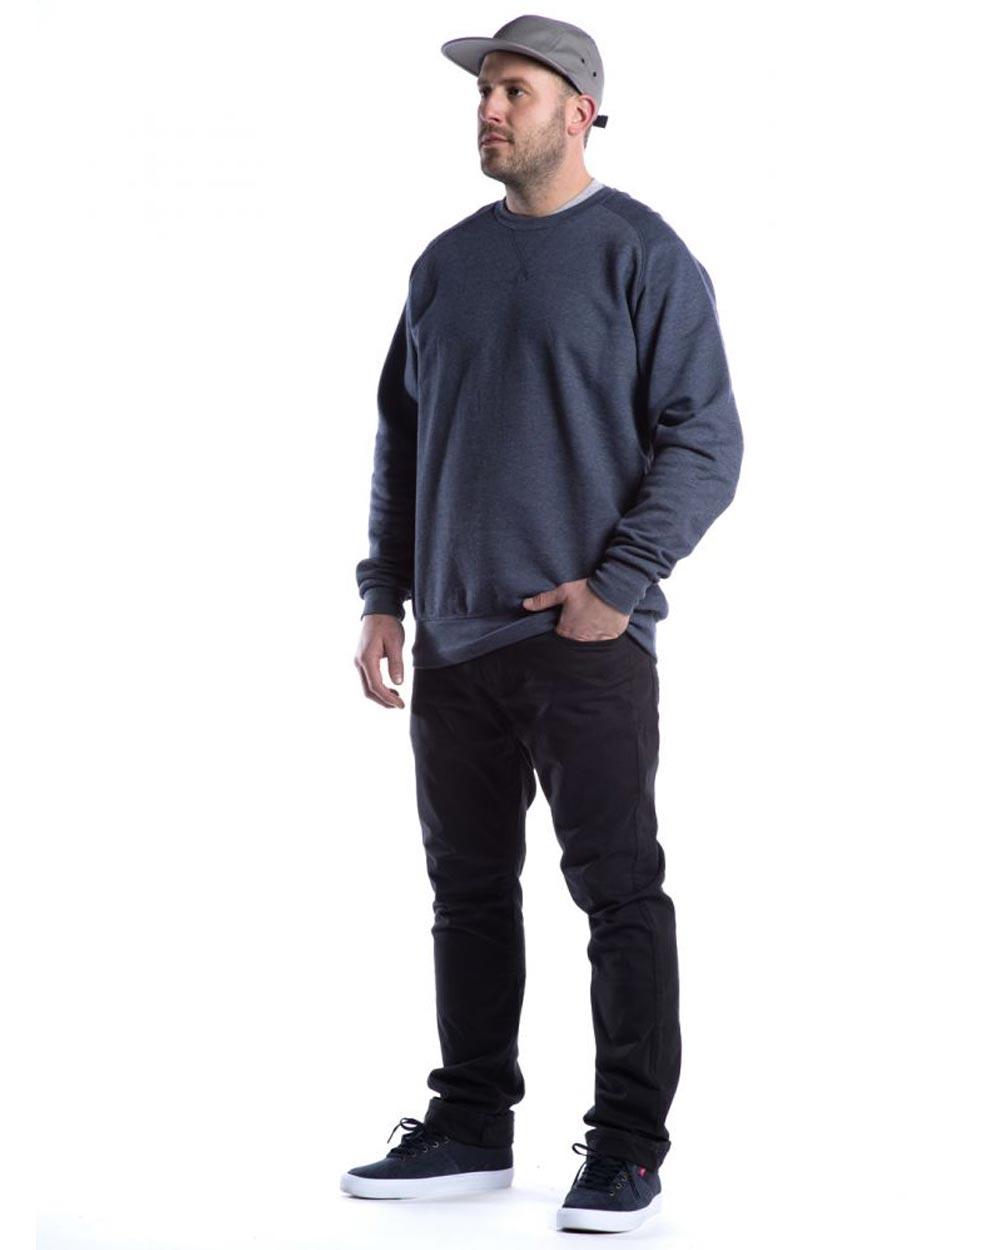 HS Apparel Crewneck Sweatshirt